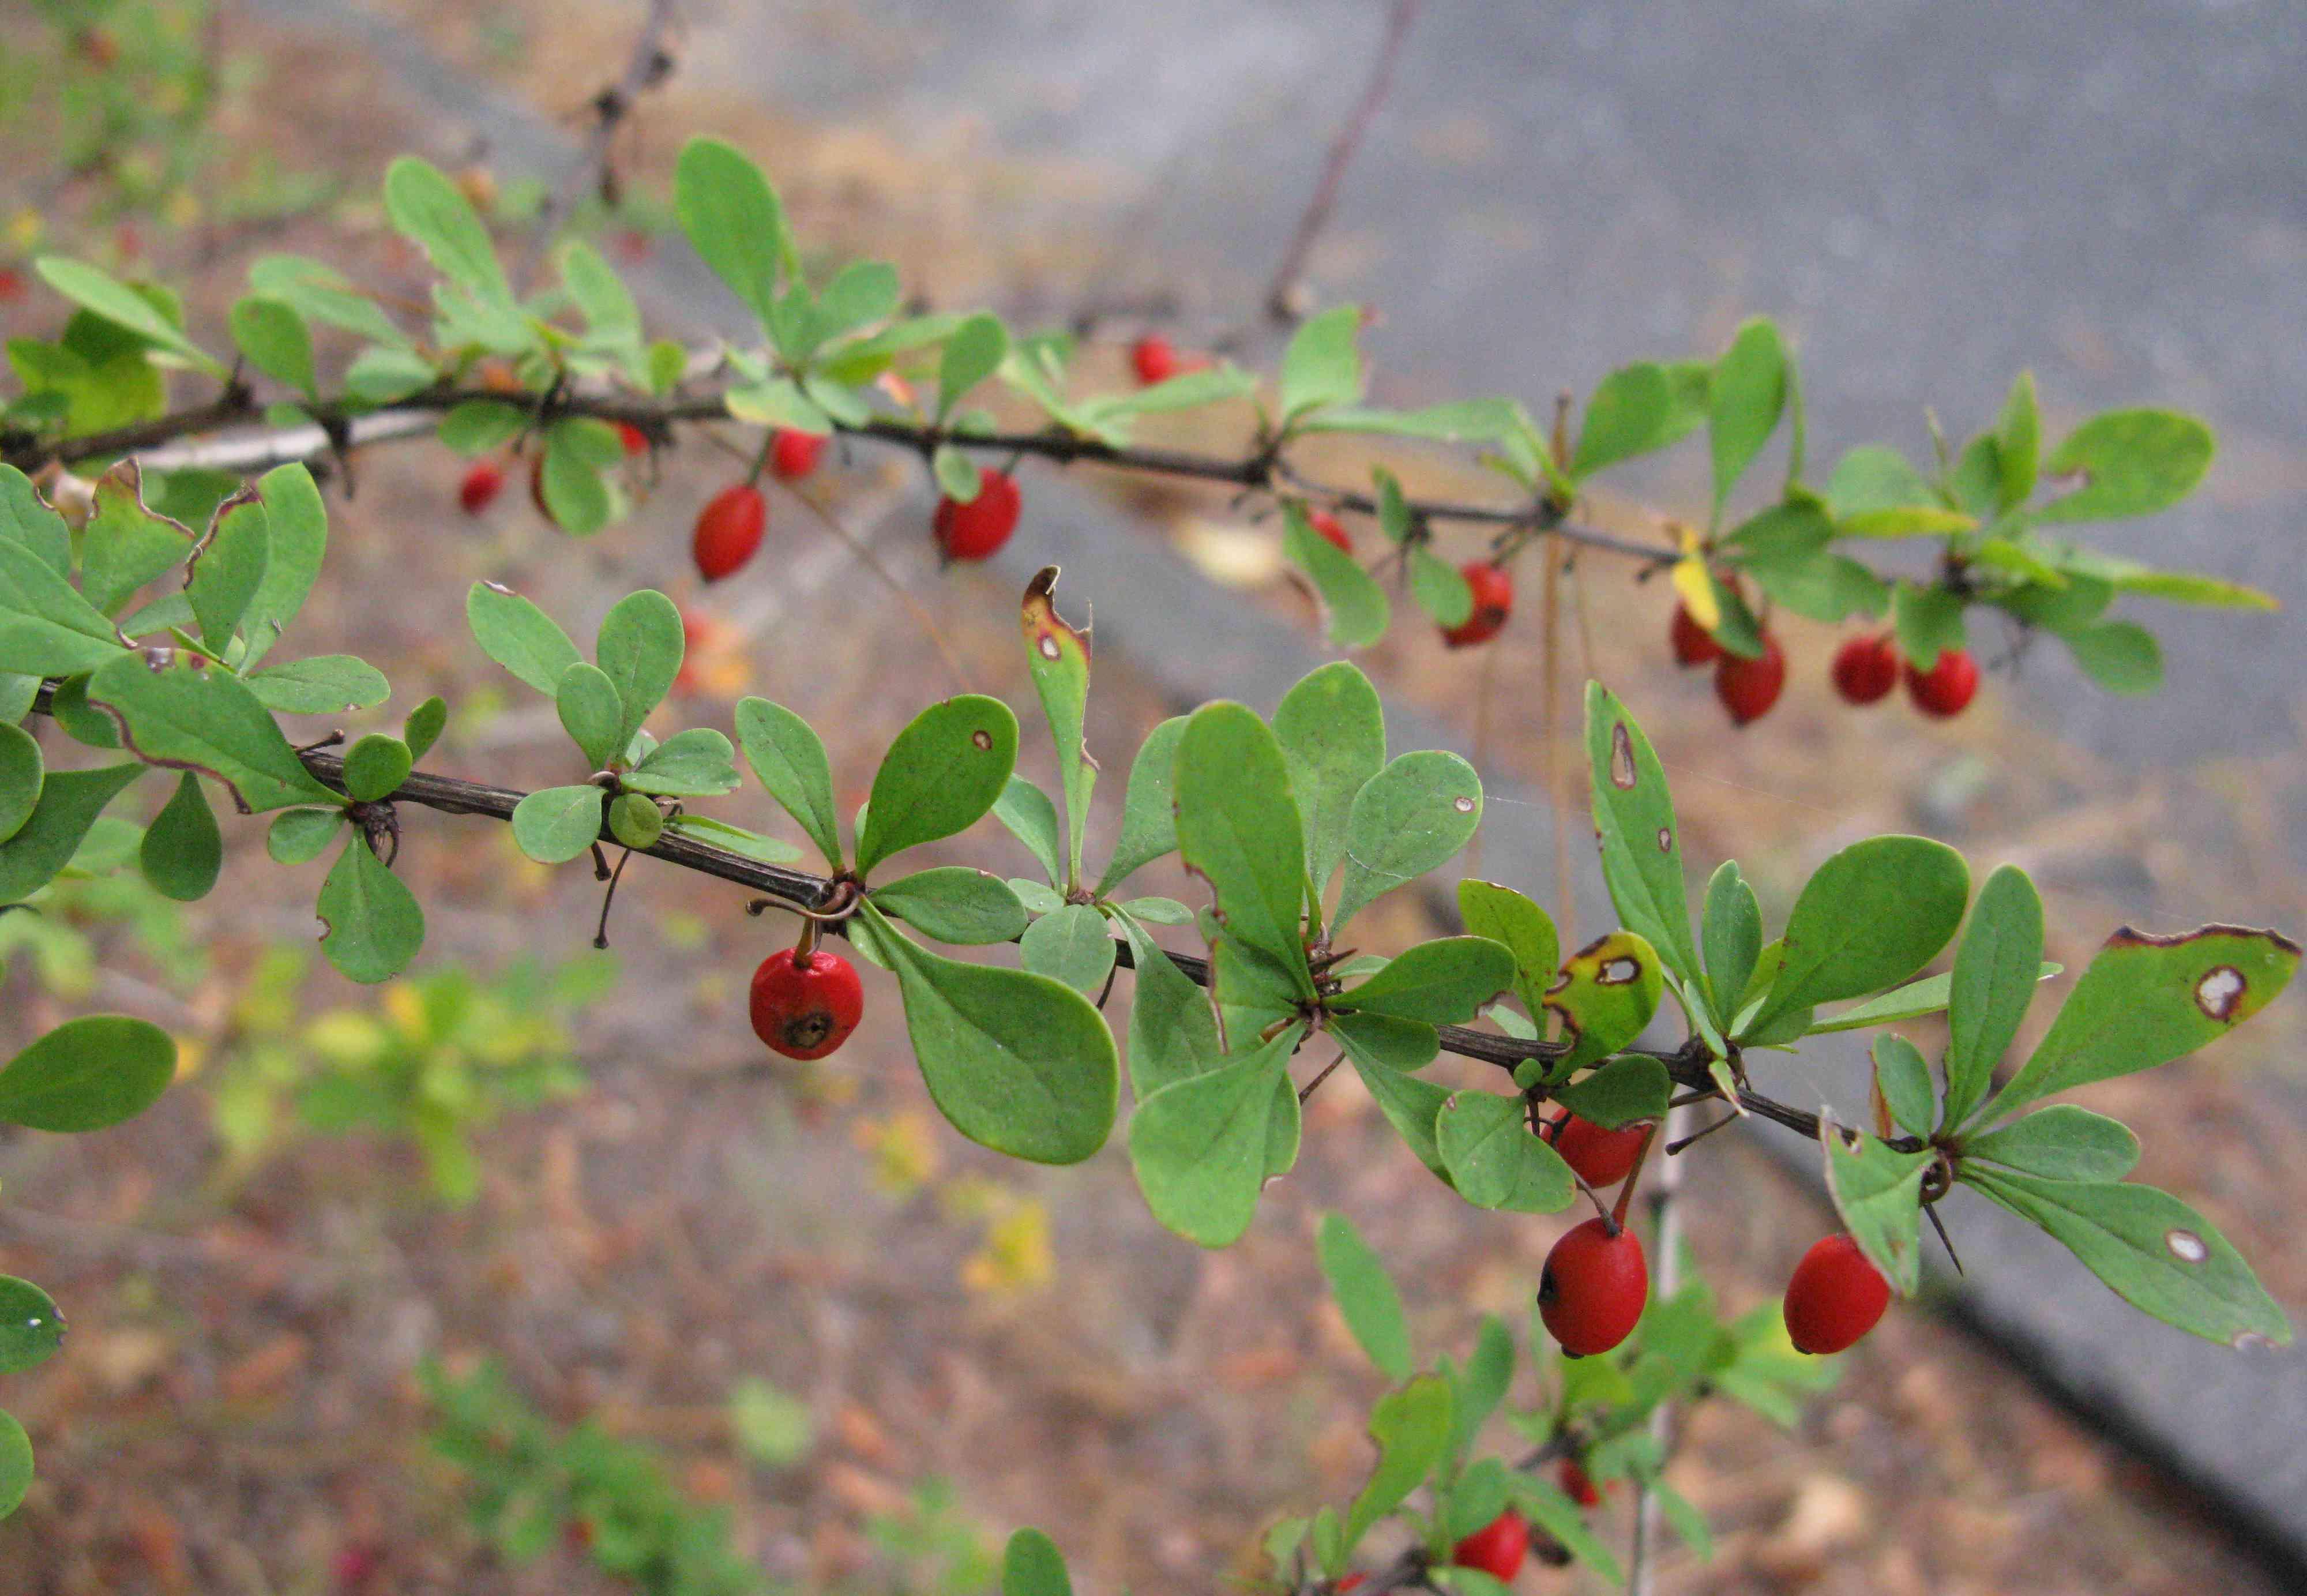 Japanese barberry, Berberis thunbergii